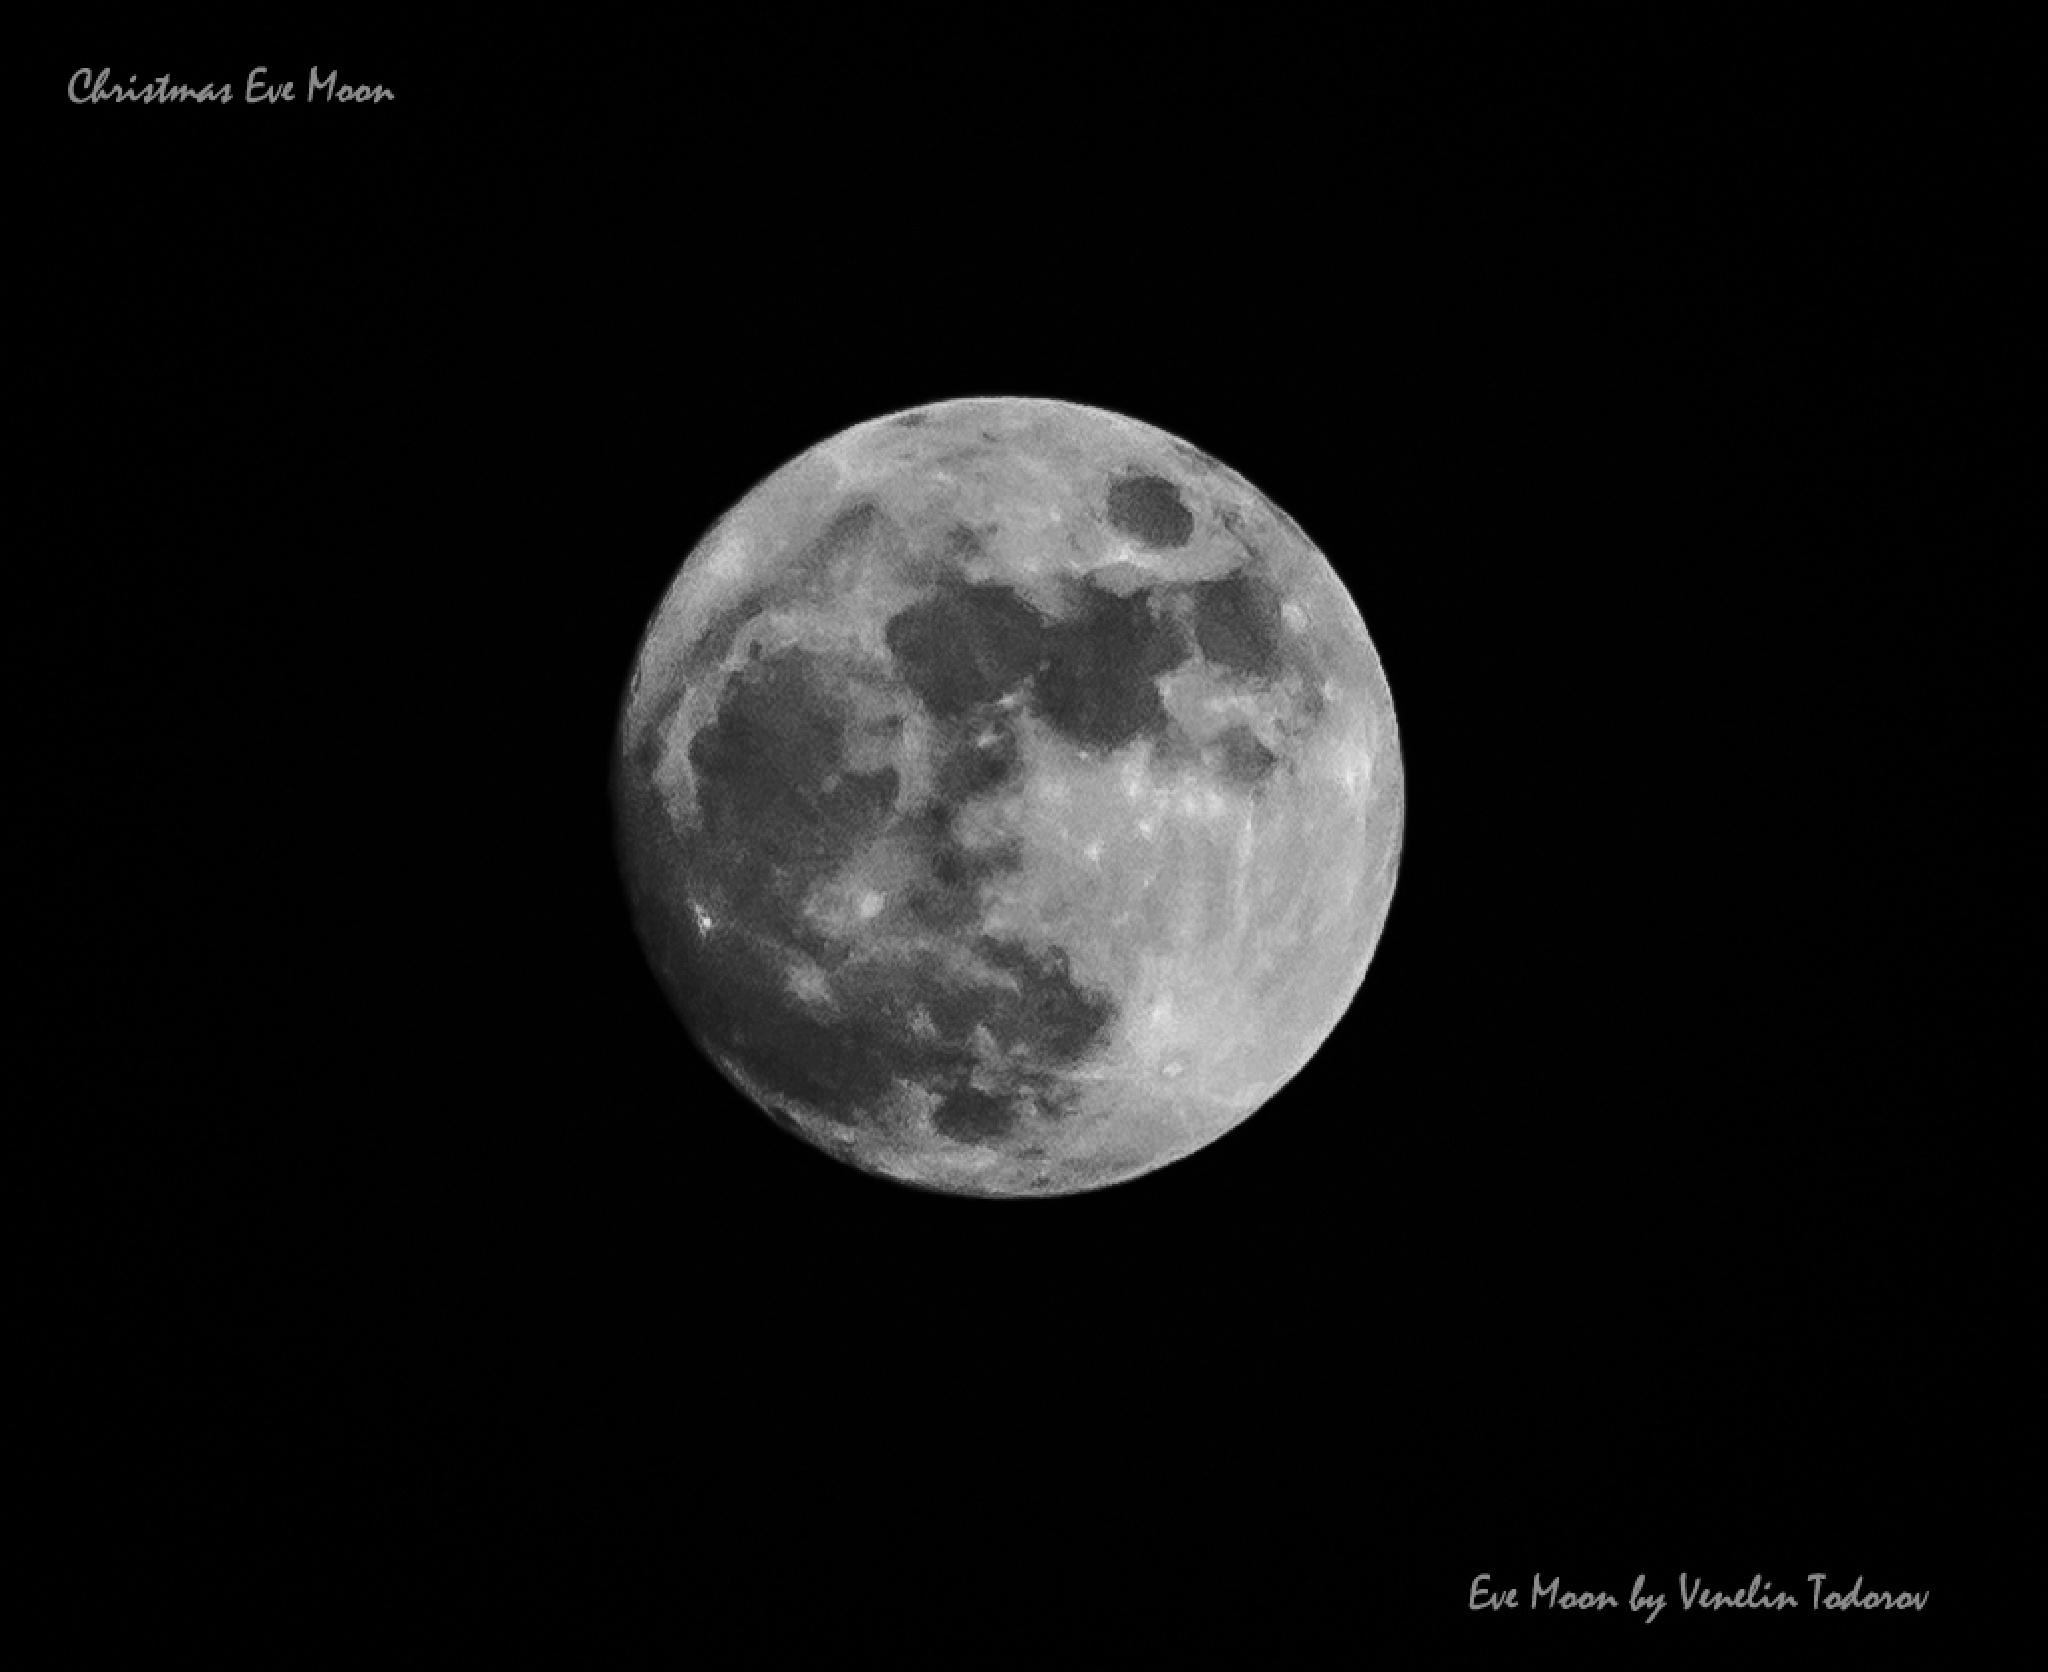 Christmas Eve Moon by Venelin Todorov